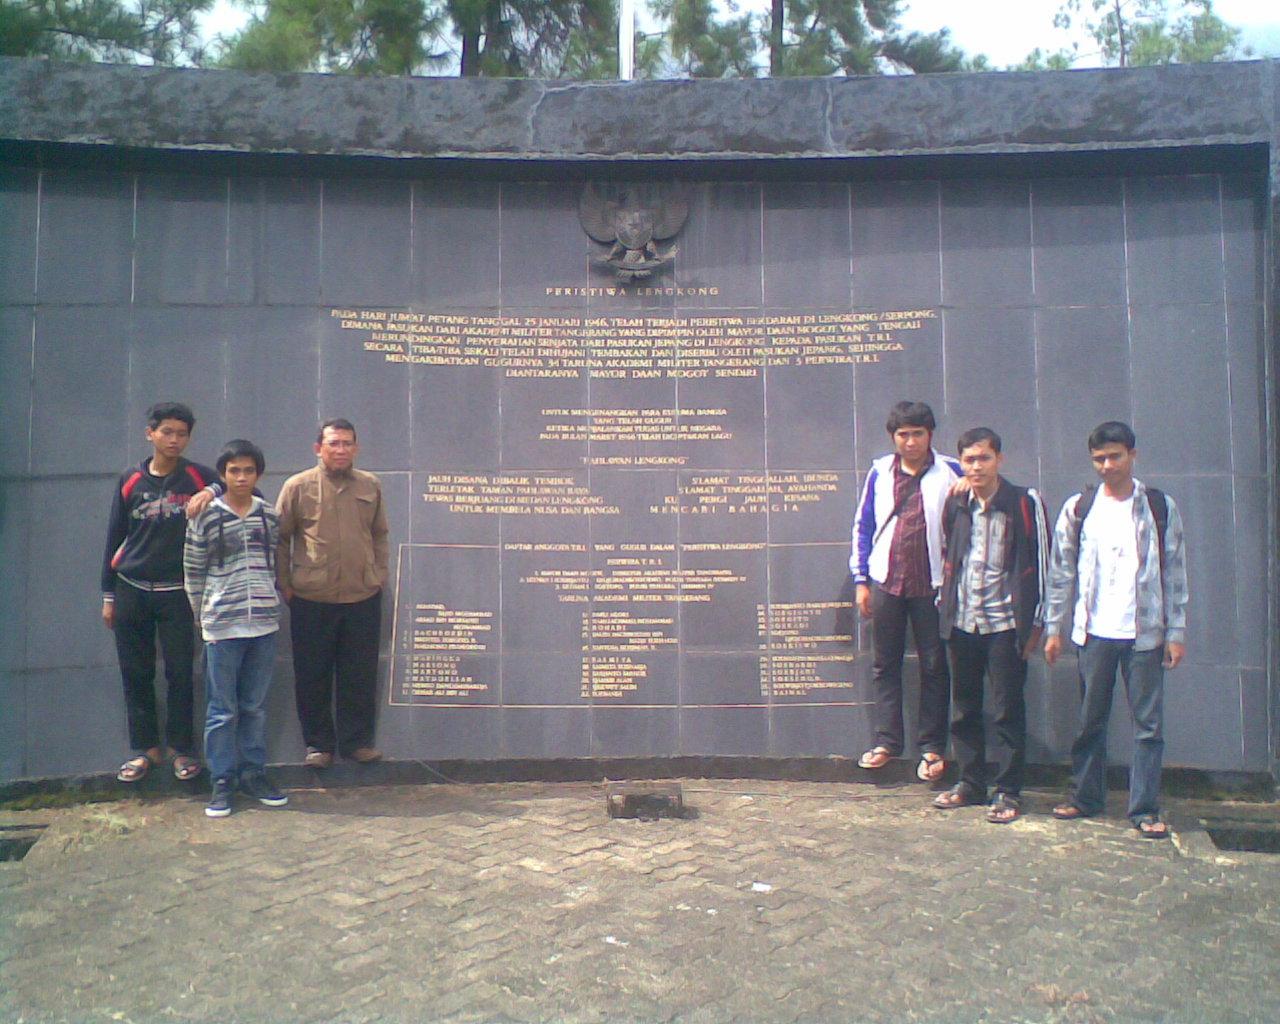 Eksplorasi Tempat Bersejarah Tangerang Taman Makam Pahlawan Seribu Bermula Postingan